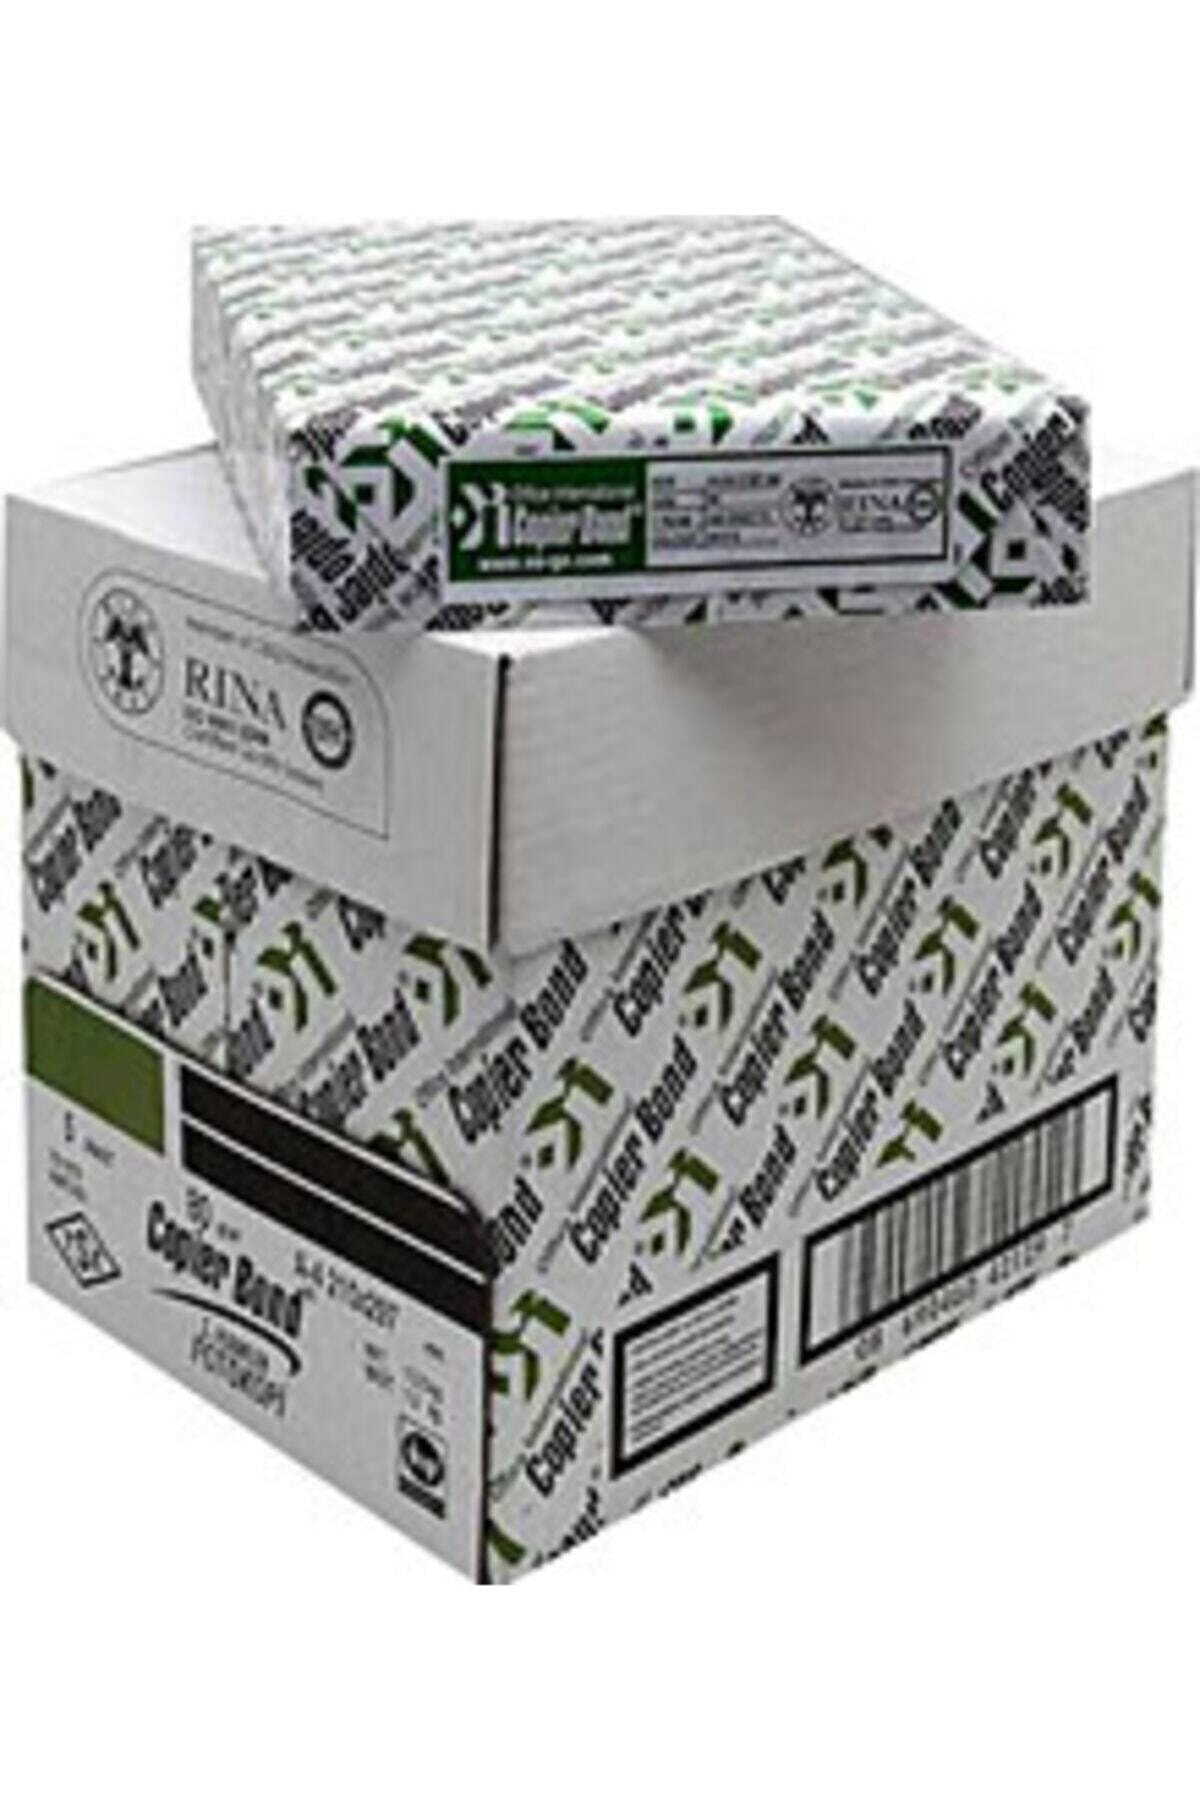 Copier Bond A4 Fotokopi Kağıdı 80g 5 Li Paket Her Pakette 500 Adet (KOLİ)